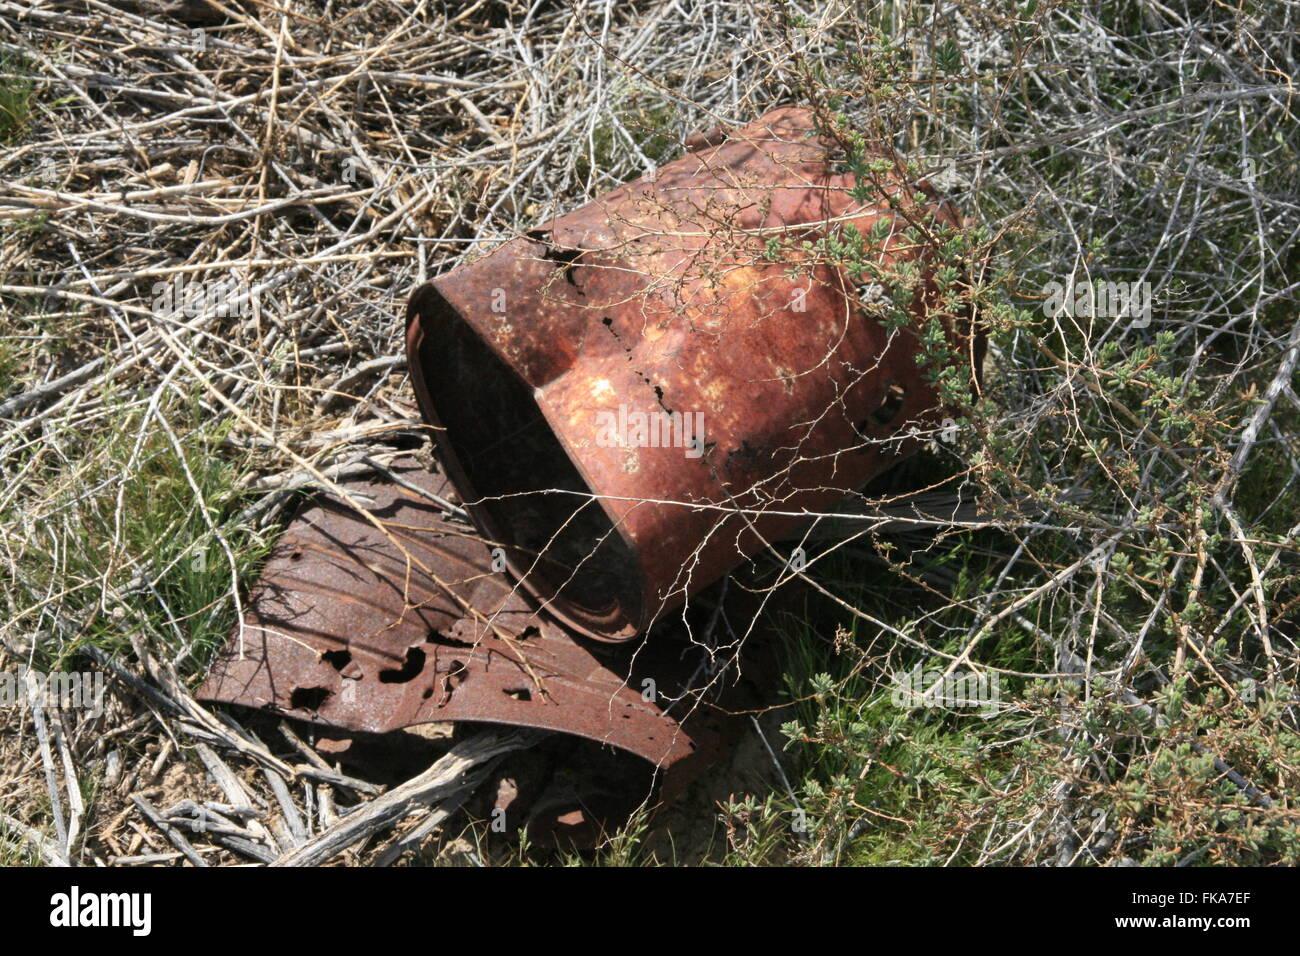 Tin Can Desert 'Trash' - Stock Image